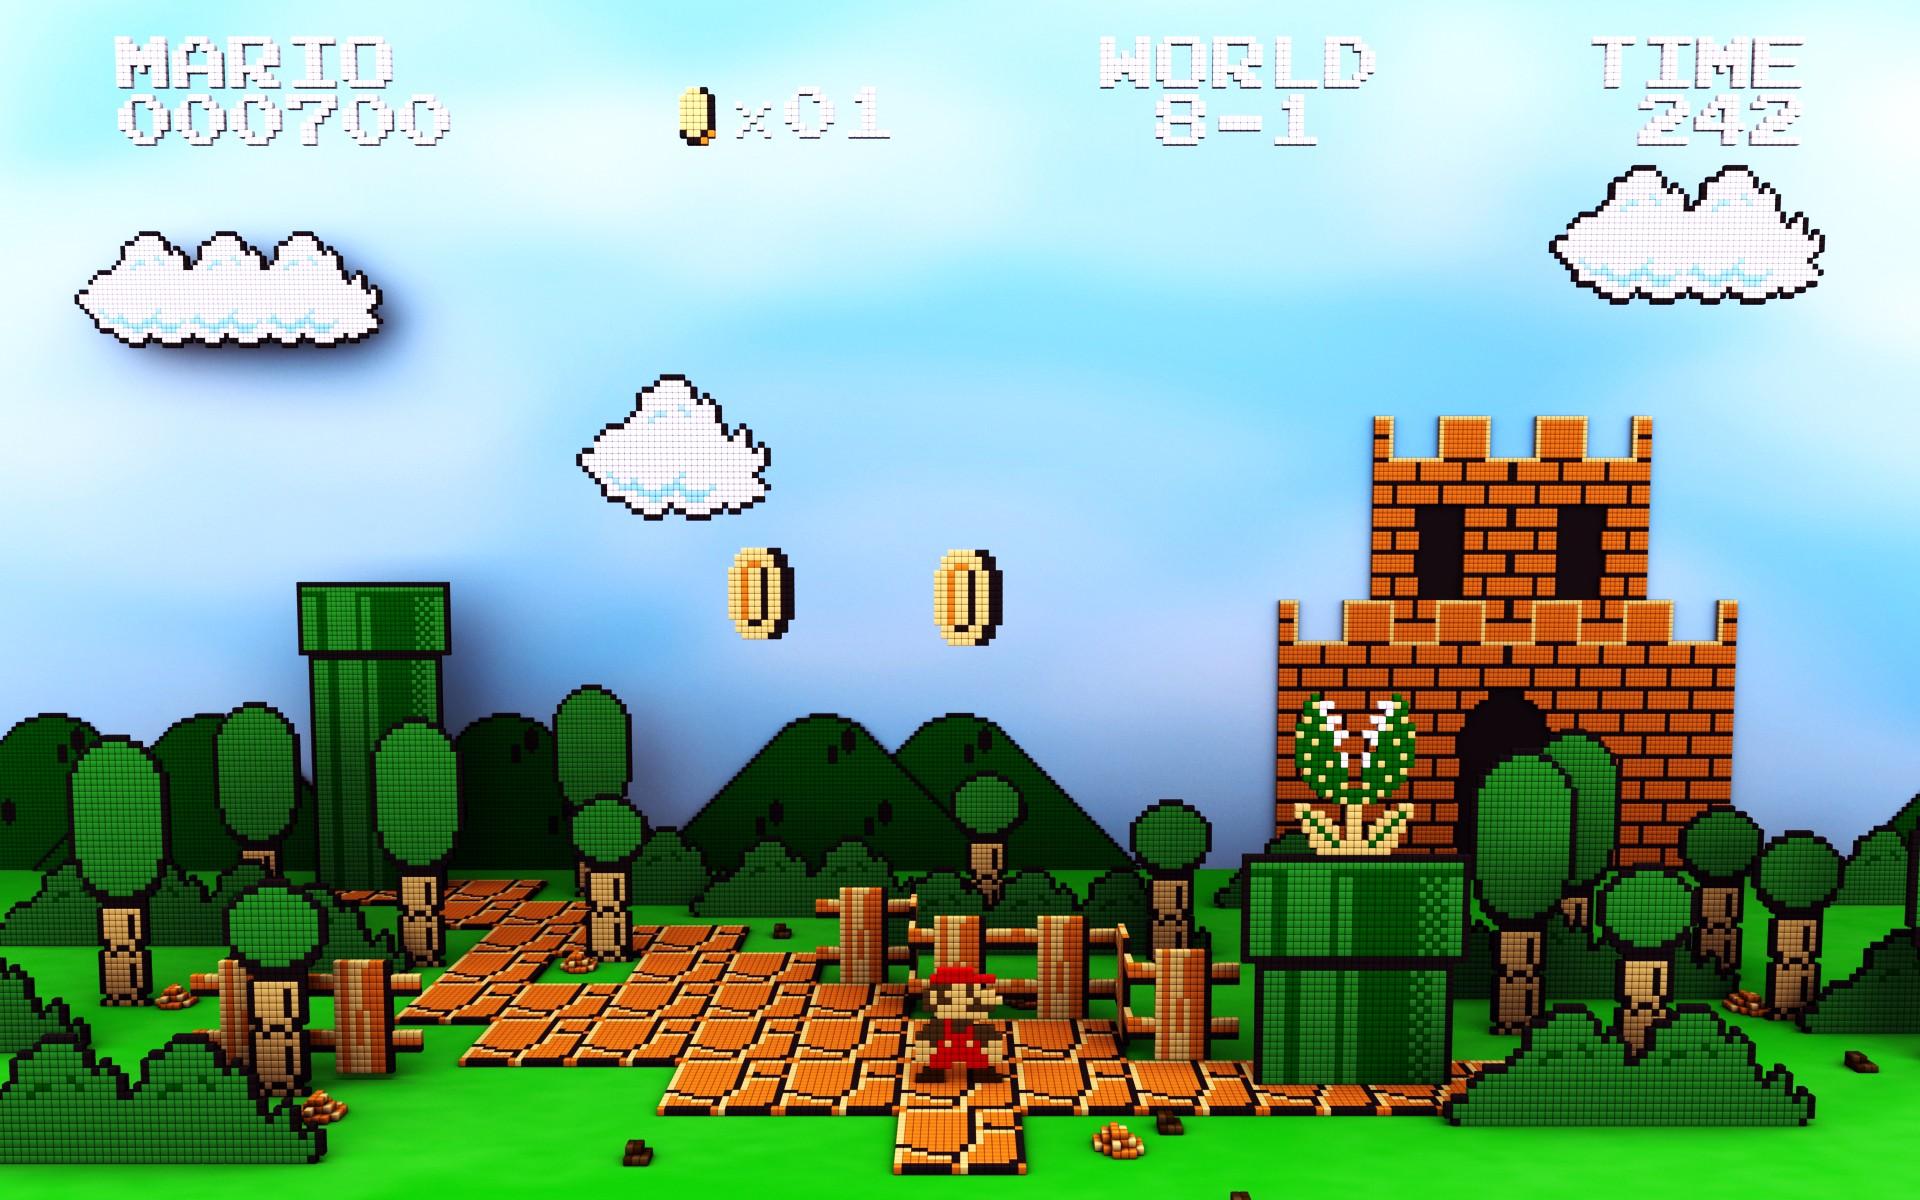 1920x1200 px 8 bit Mario Bros Nintendo Entertainment System pixel art retro games video games